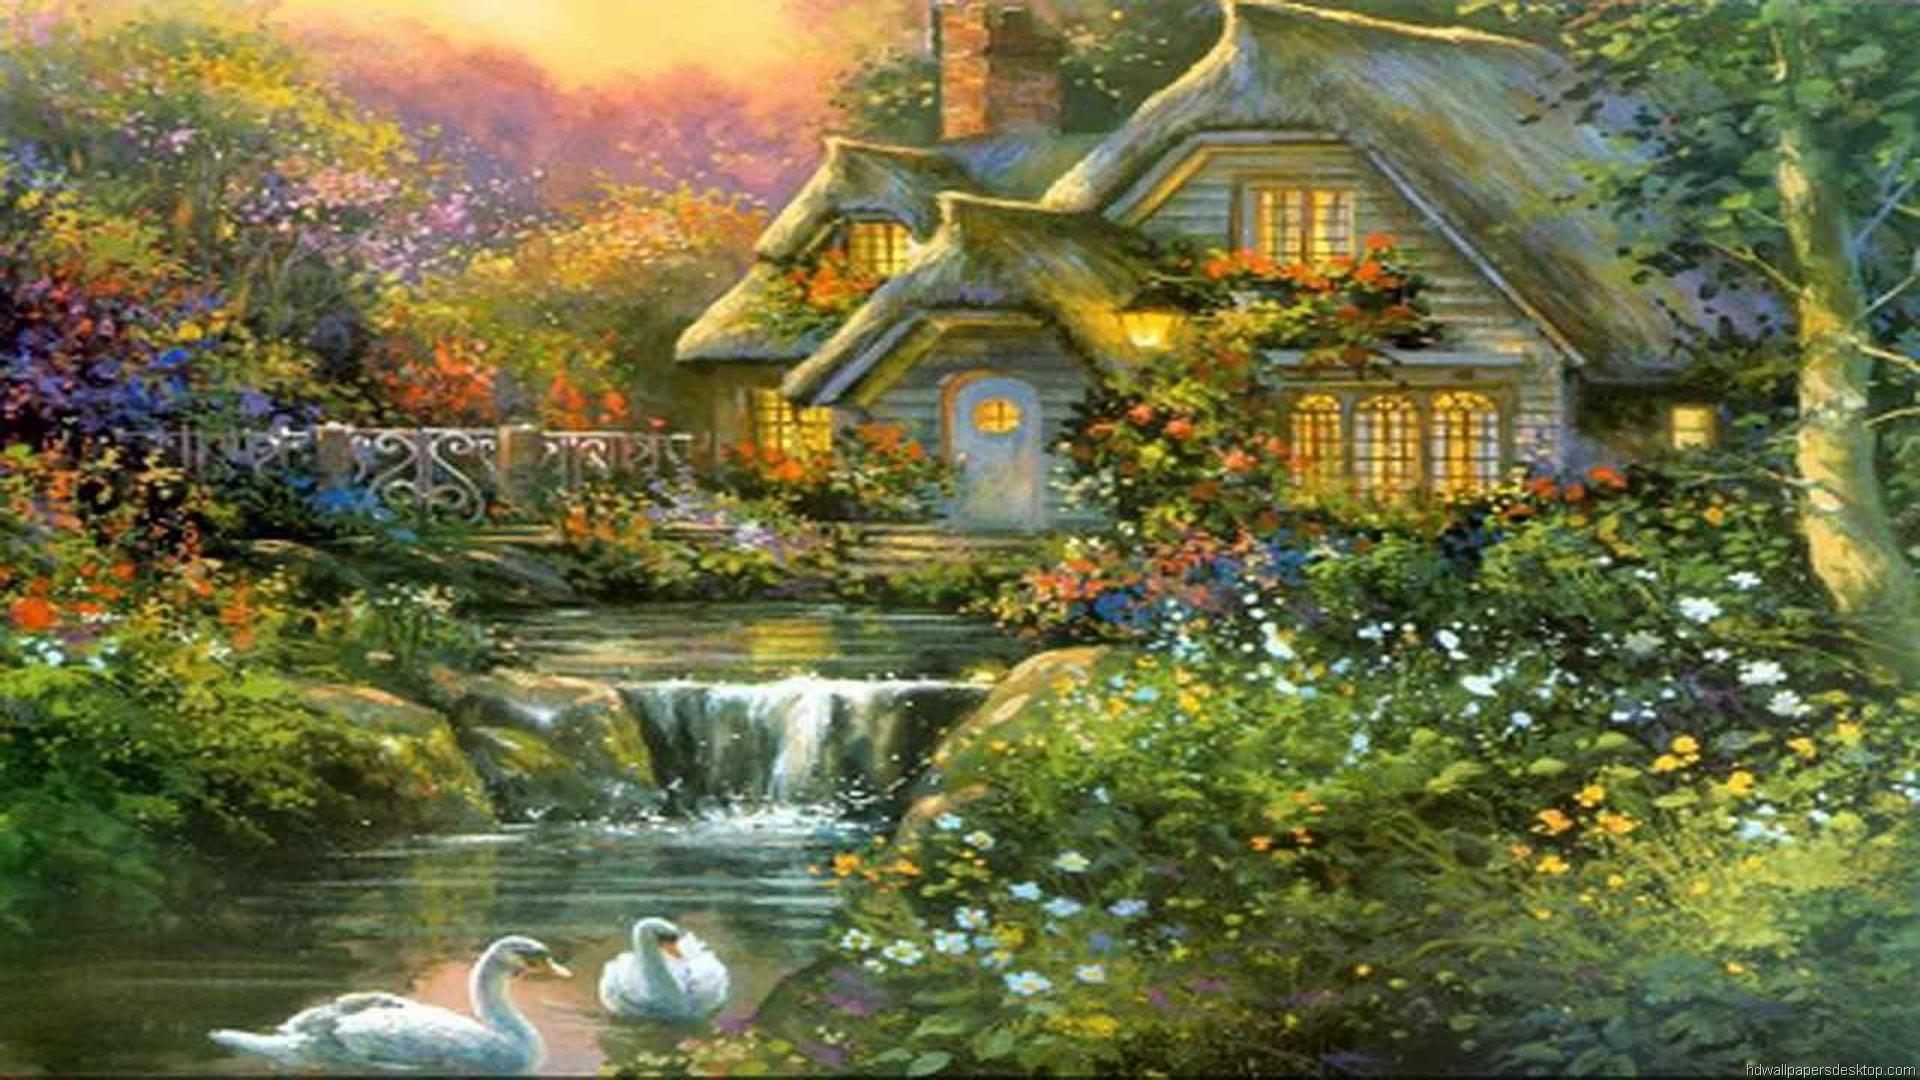 Wallpaper Paintings Art HD Desktop Thomas Kinkade Painting 23 1920x1080